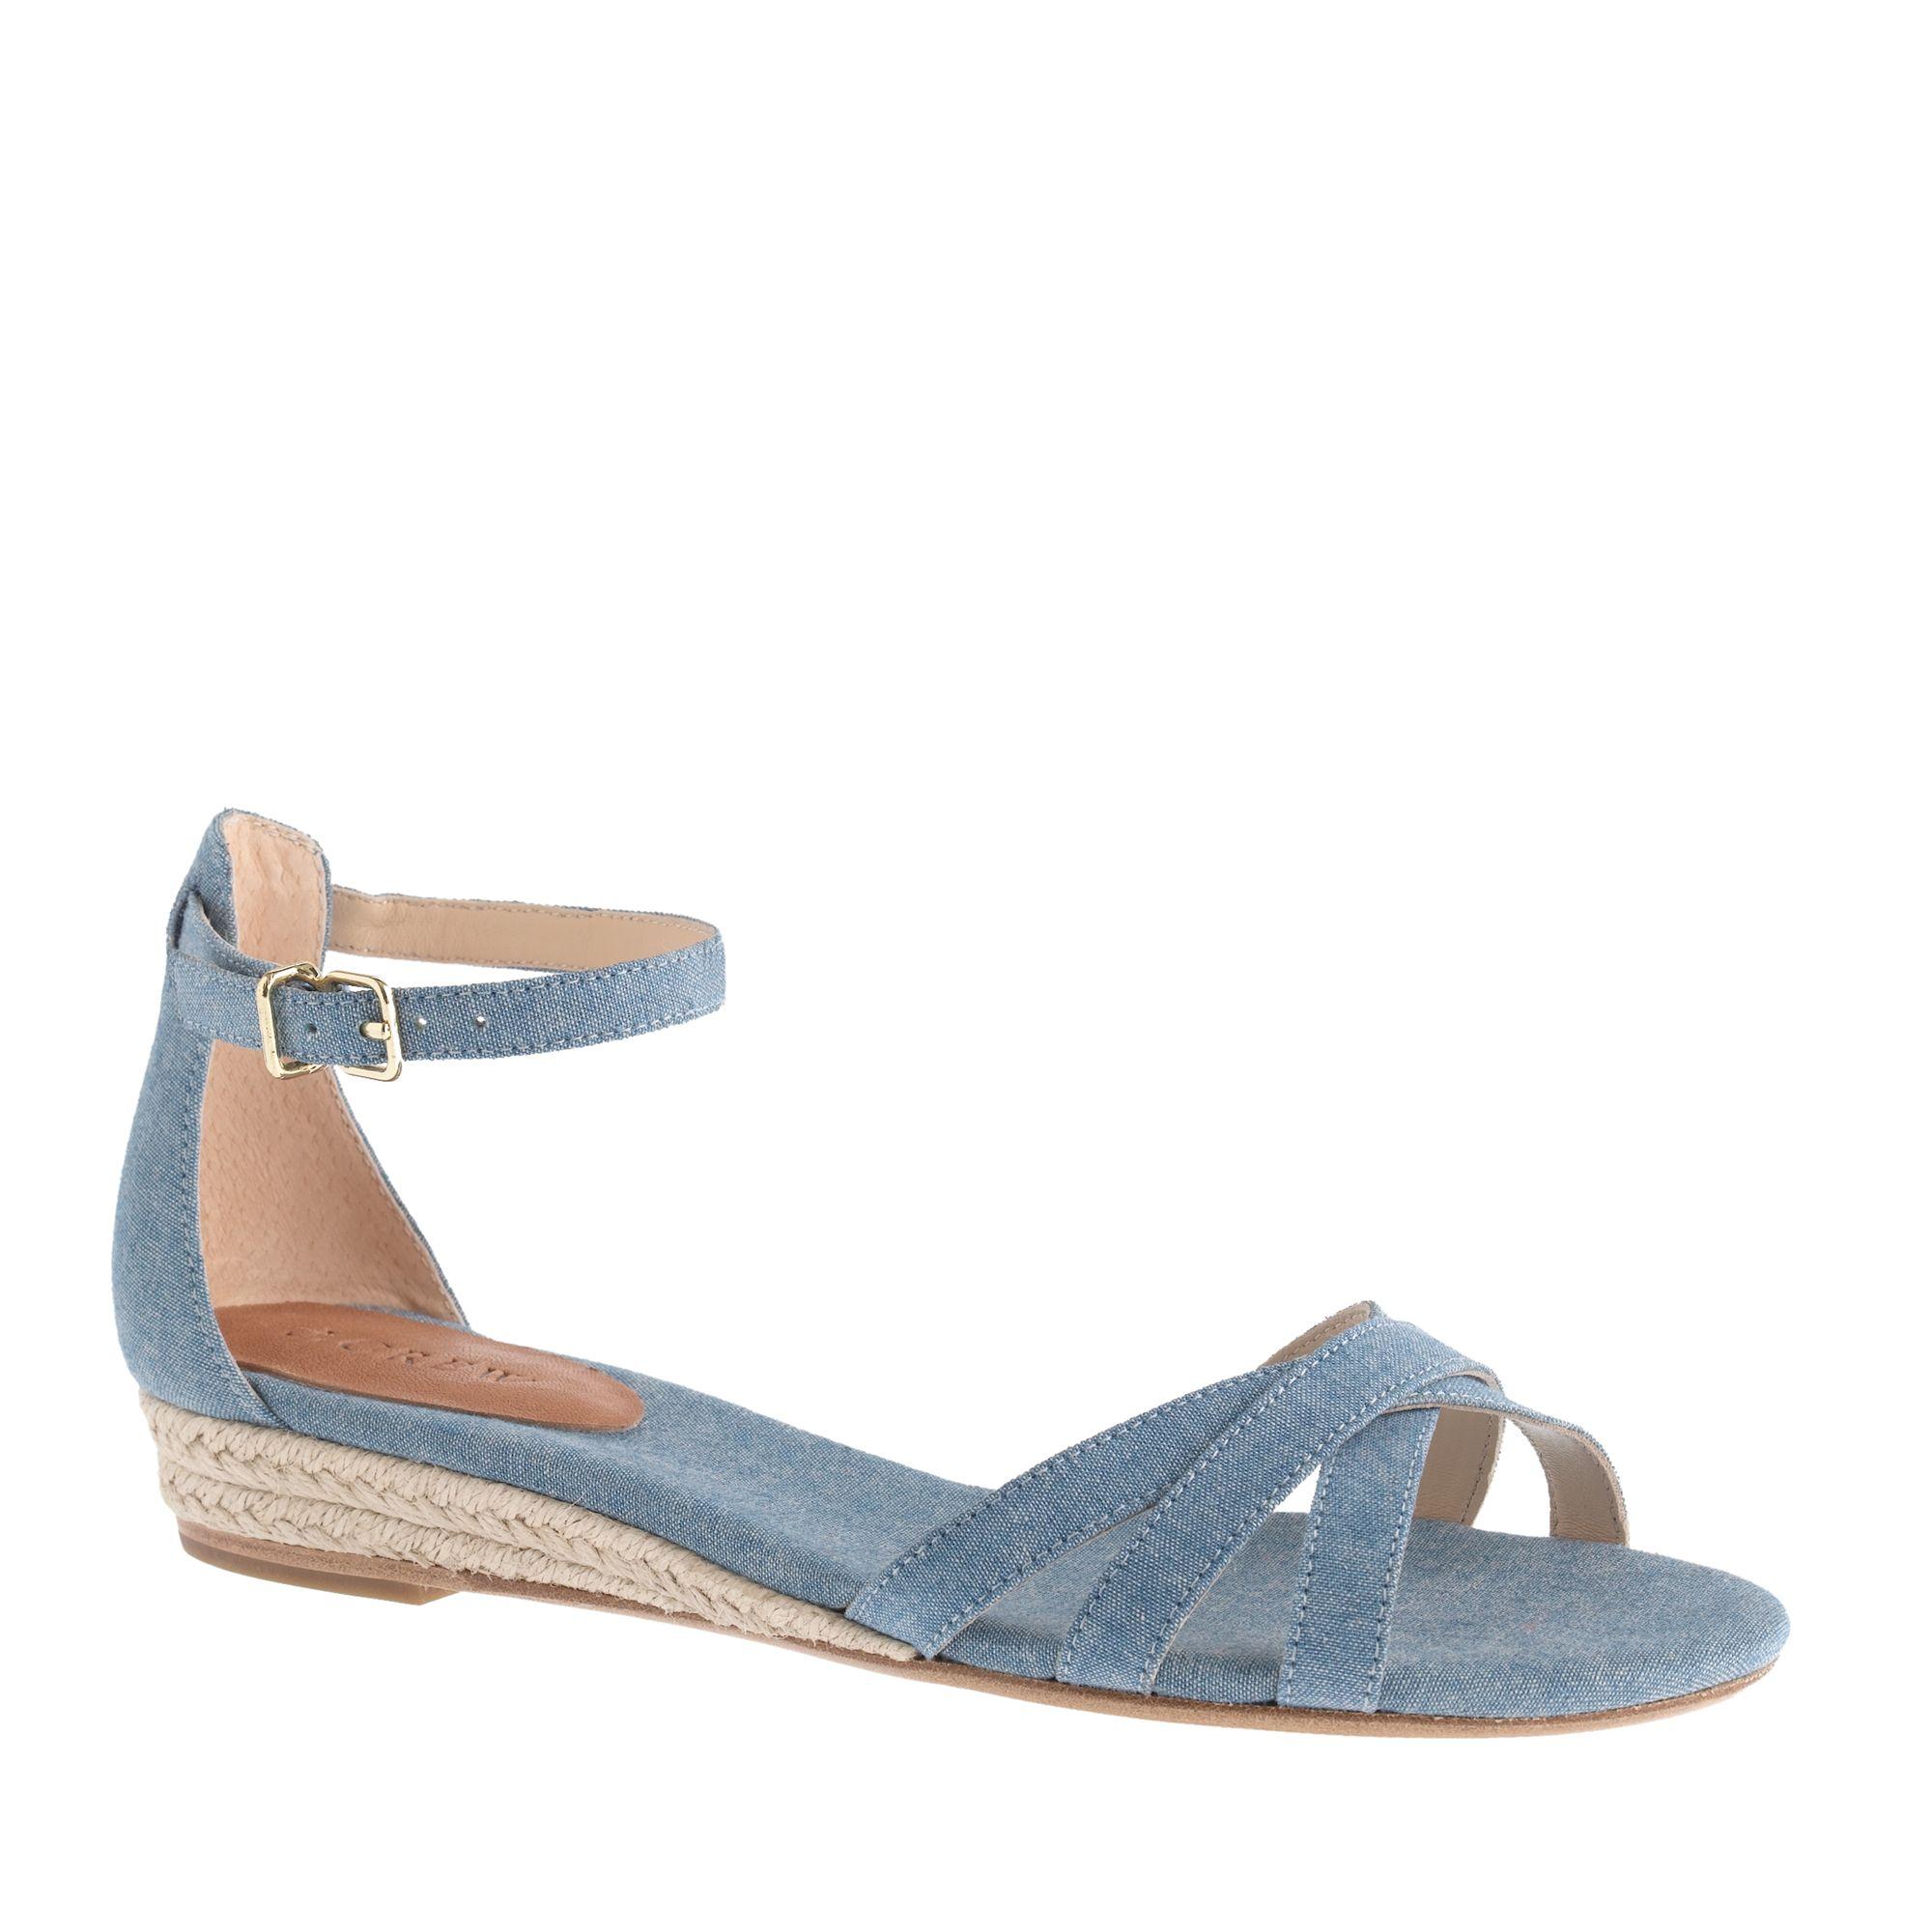 Shoe Designer With Heels Like Tibi